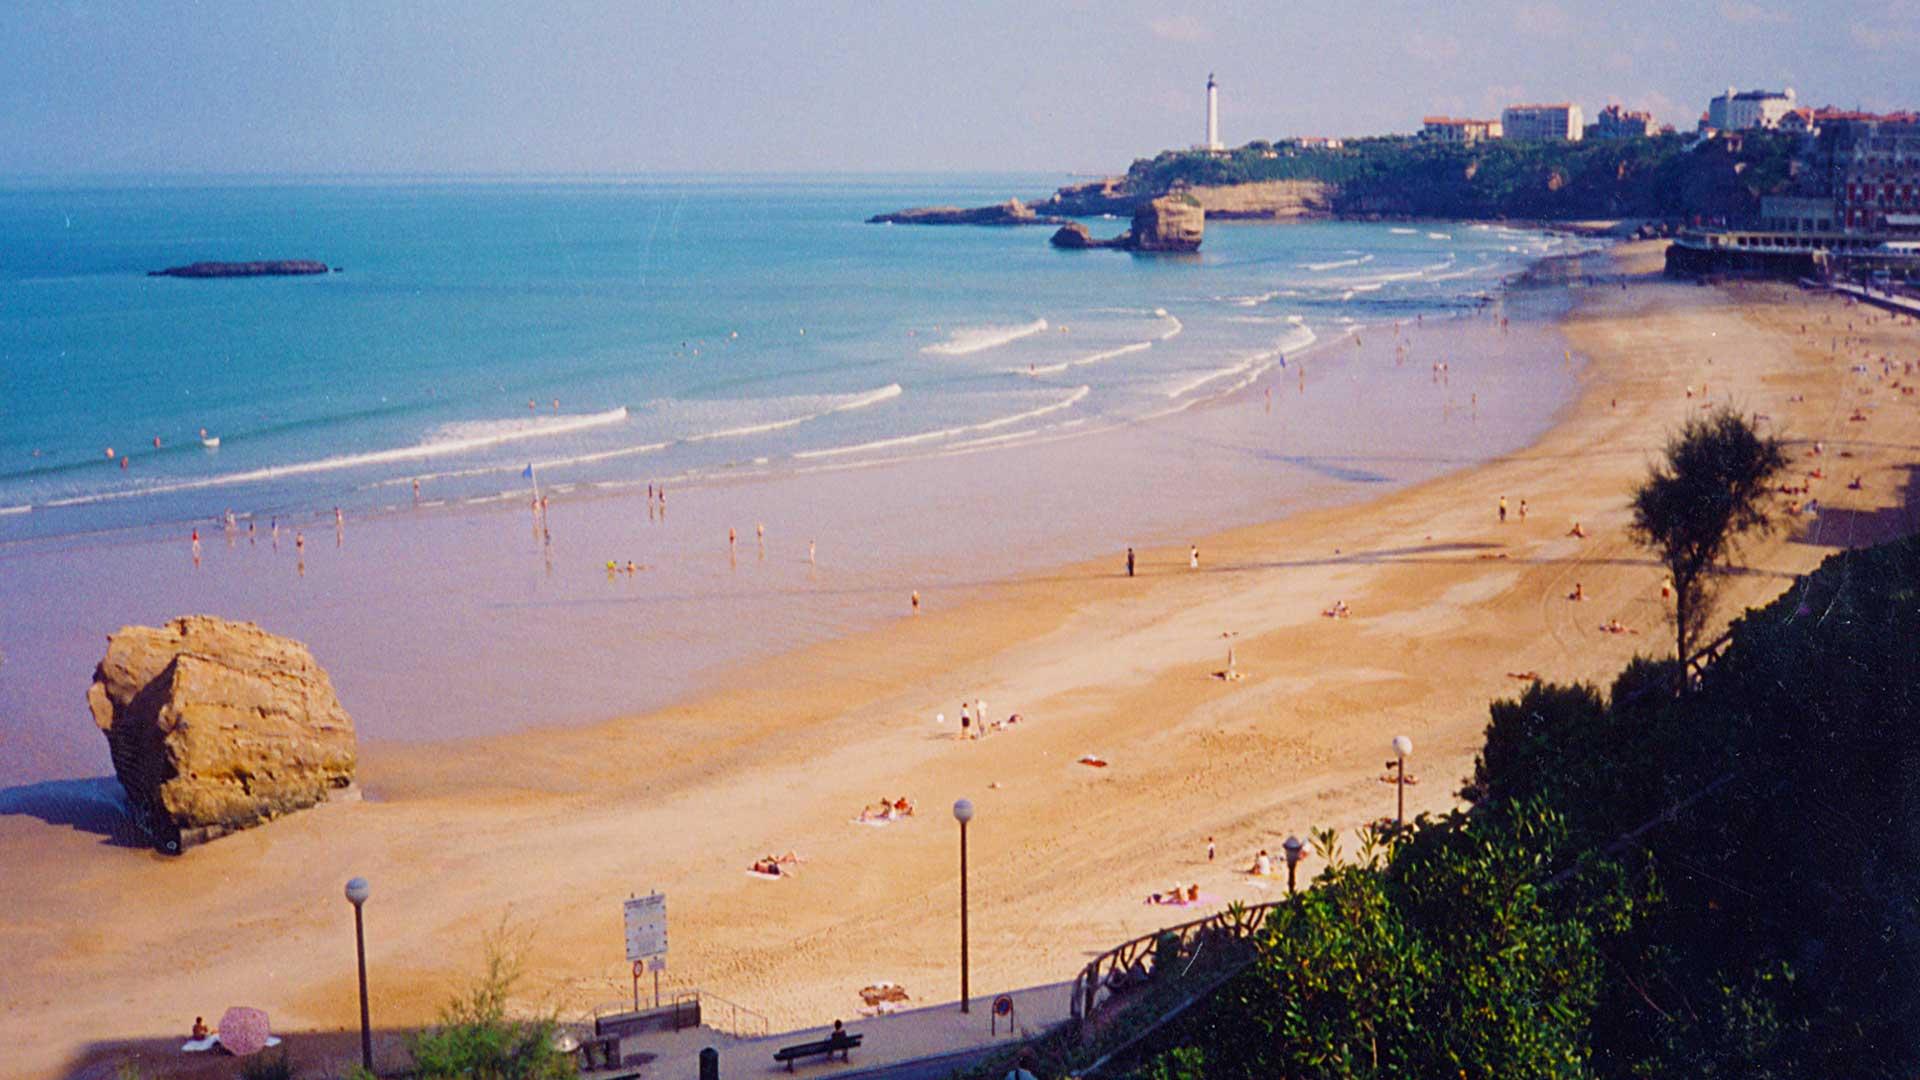 Steven Andrew Martin | Surfing Grande Plage, Biarritz, France | 1993 Surf Journal